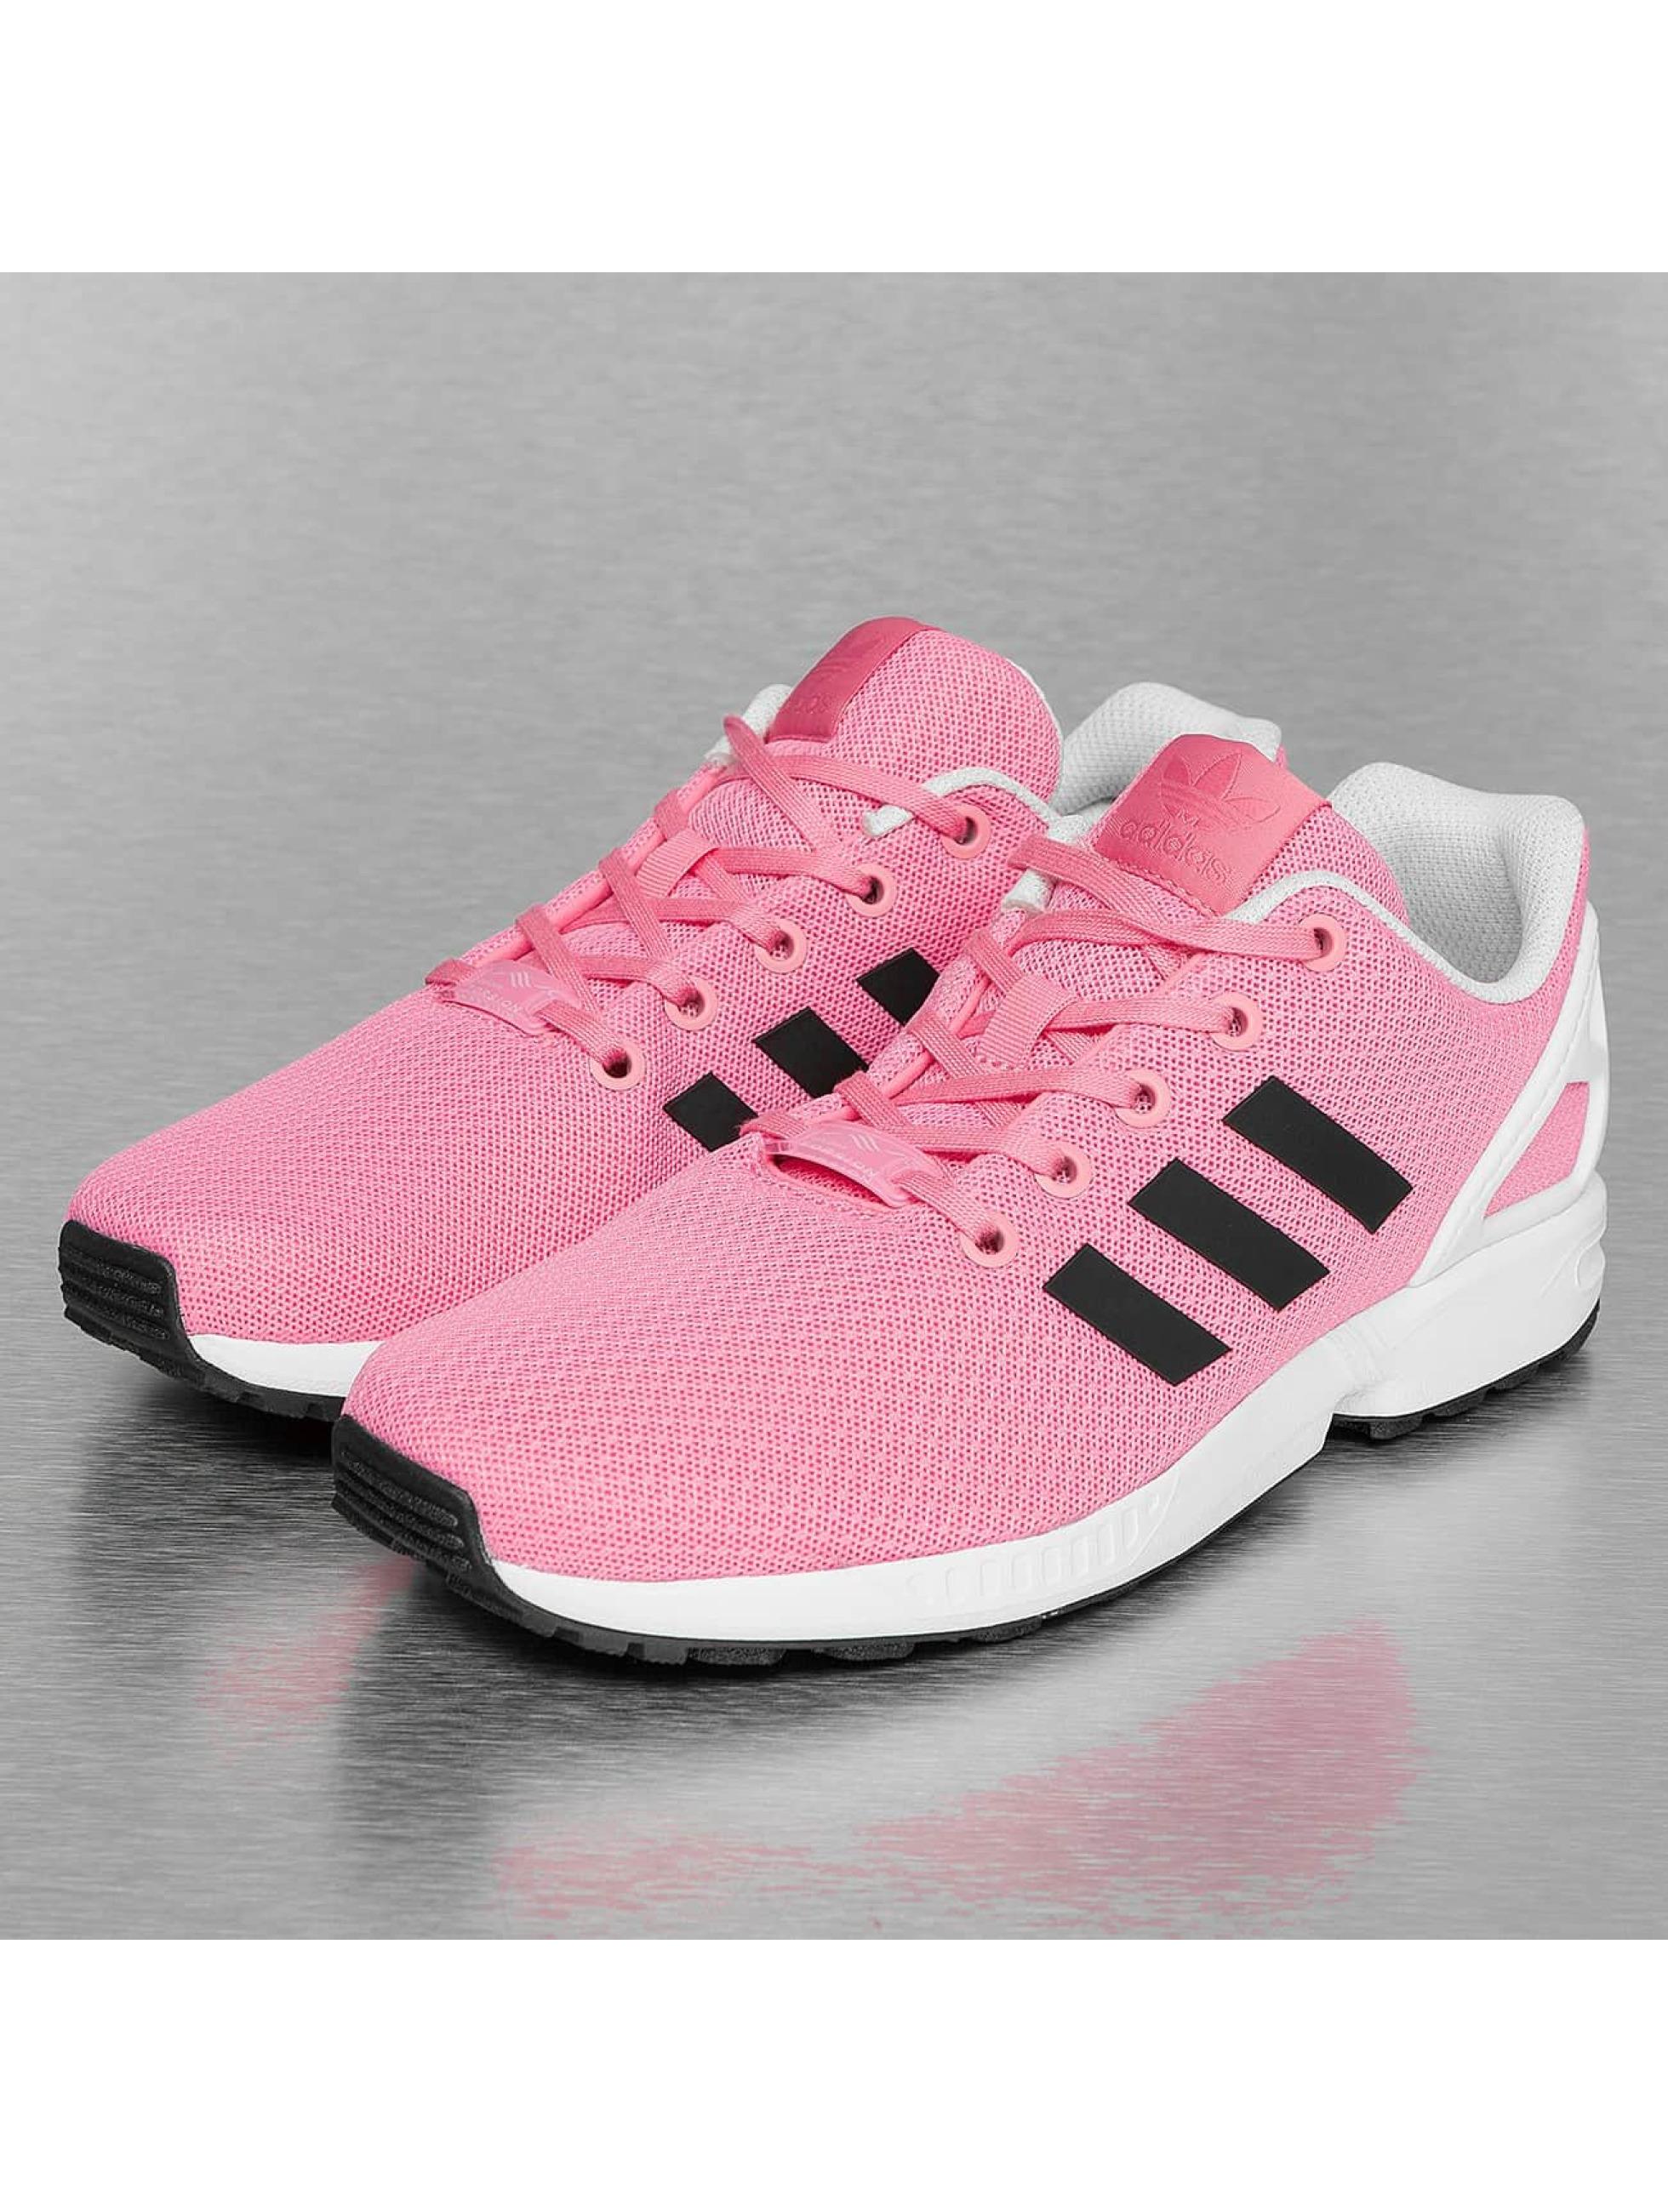 buy online 6b963 8f020 ... adidas Chaussures   Baskets ZX Flux J en magenta ...